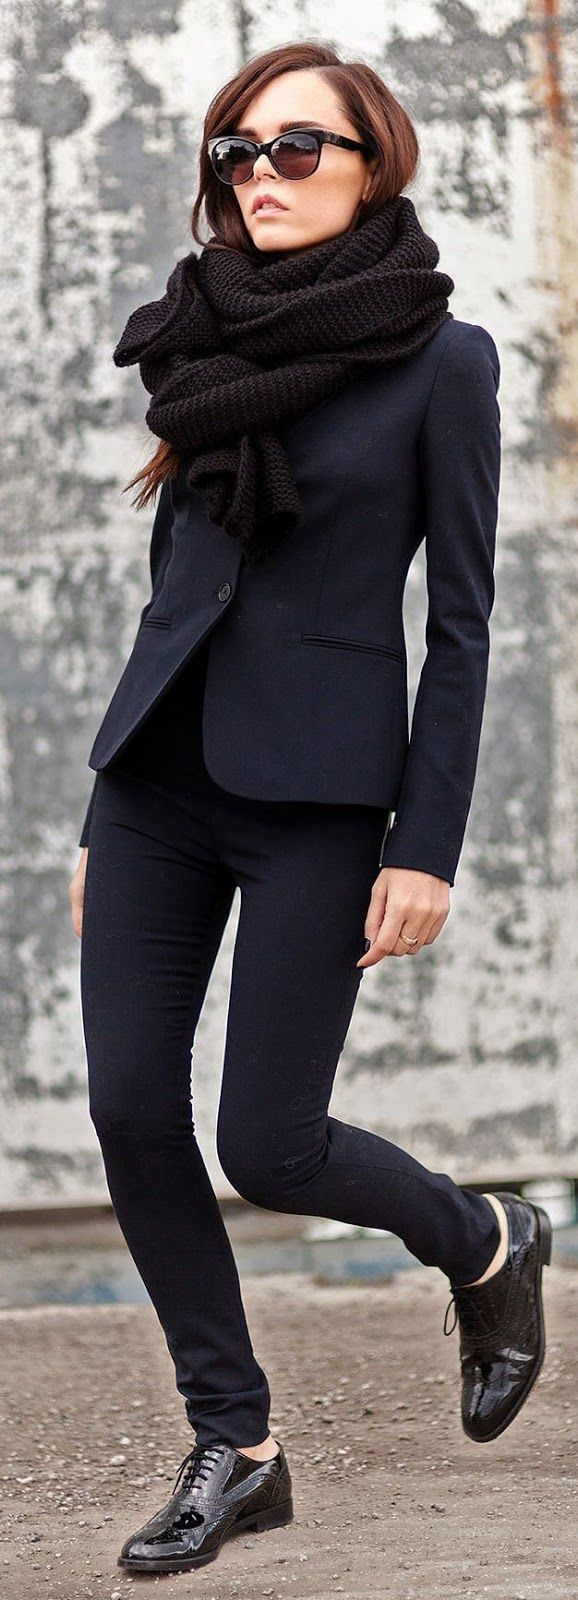 Just a Pretty Style: Women's fashion elegant blazer and scarf